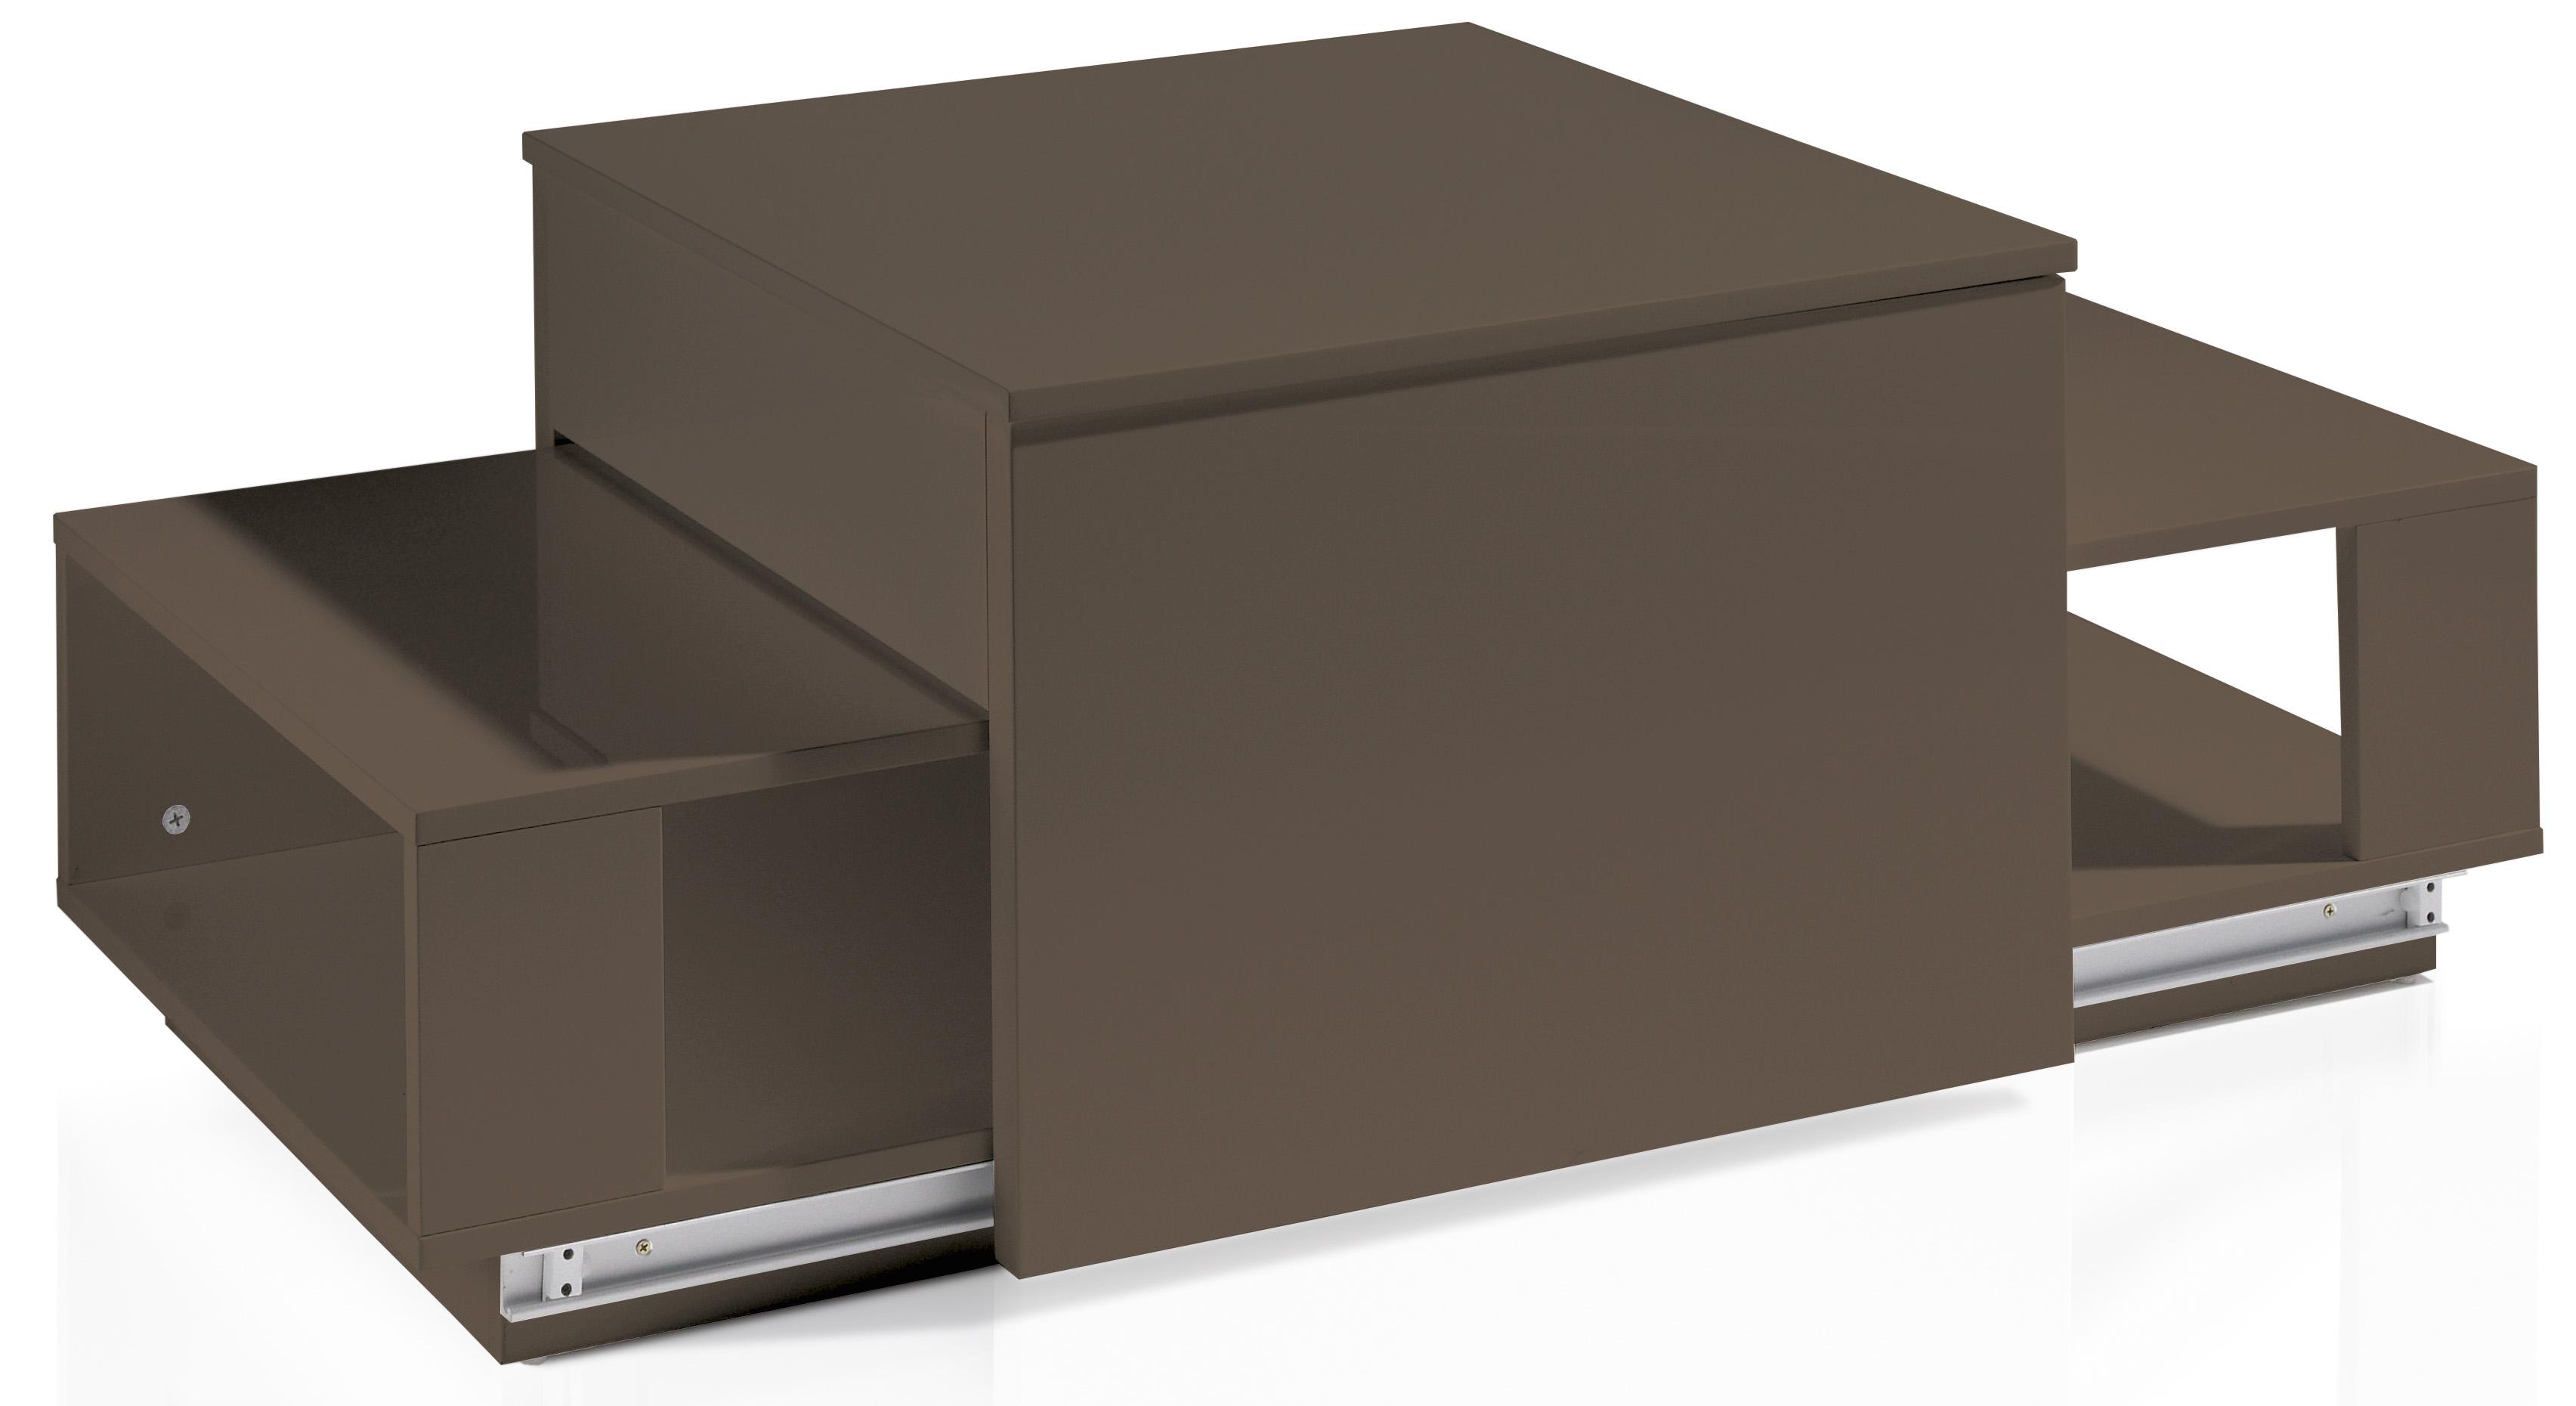 table basse relevable laqu e marron optima. Black Bedroom Furniture Sets. Home Design Ideas